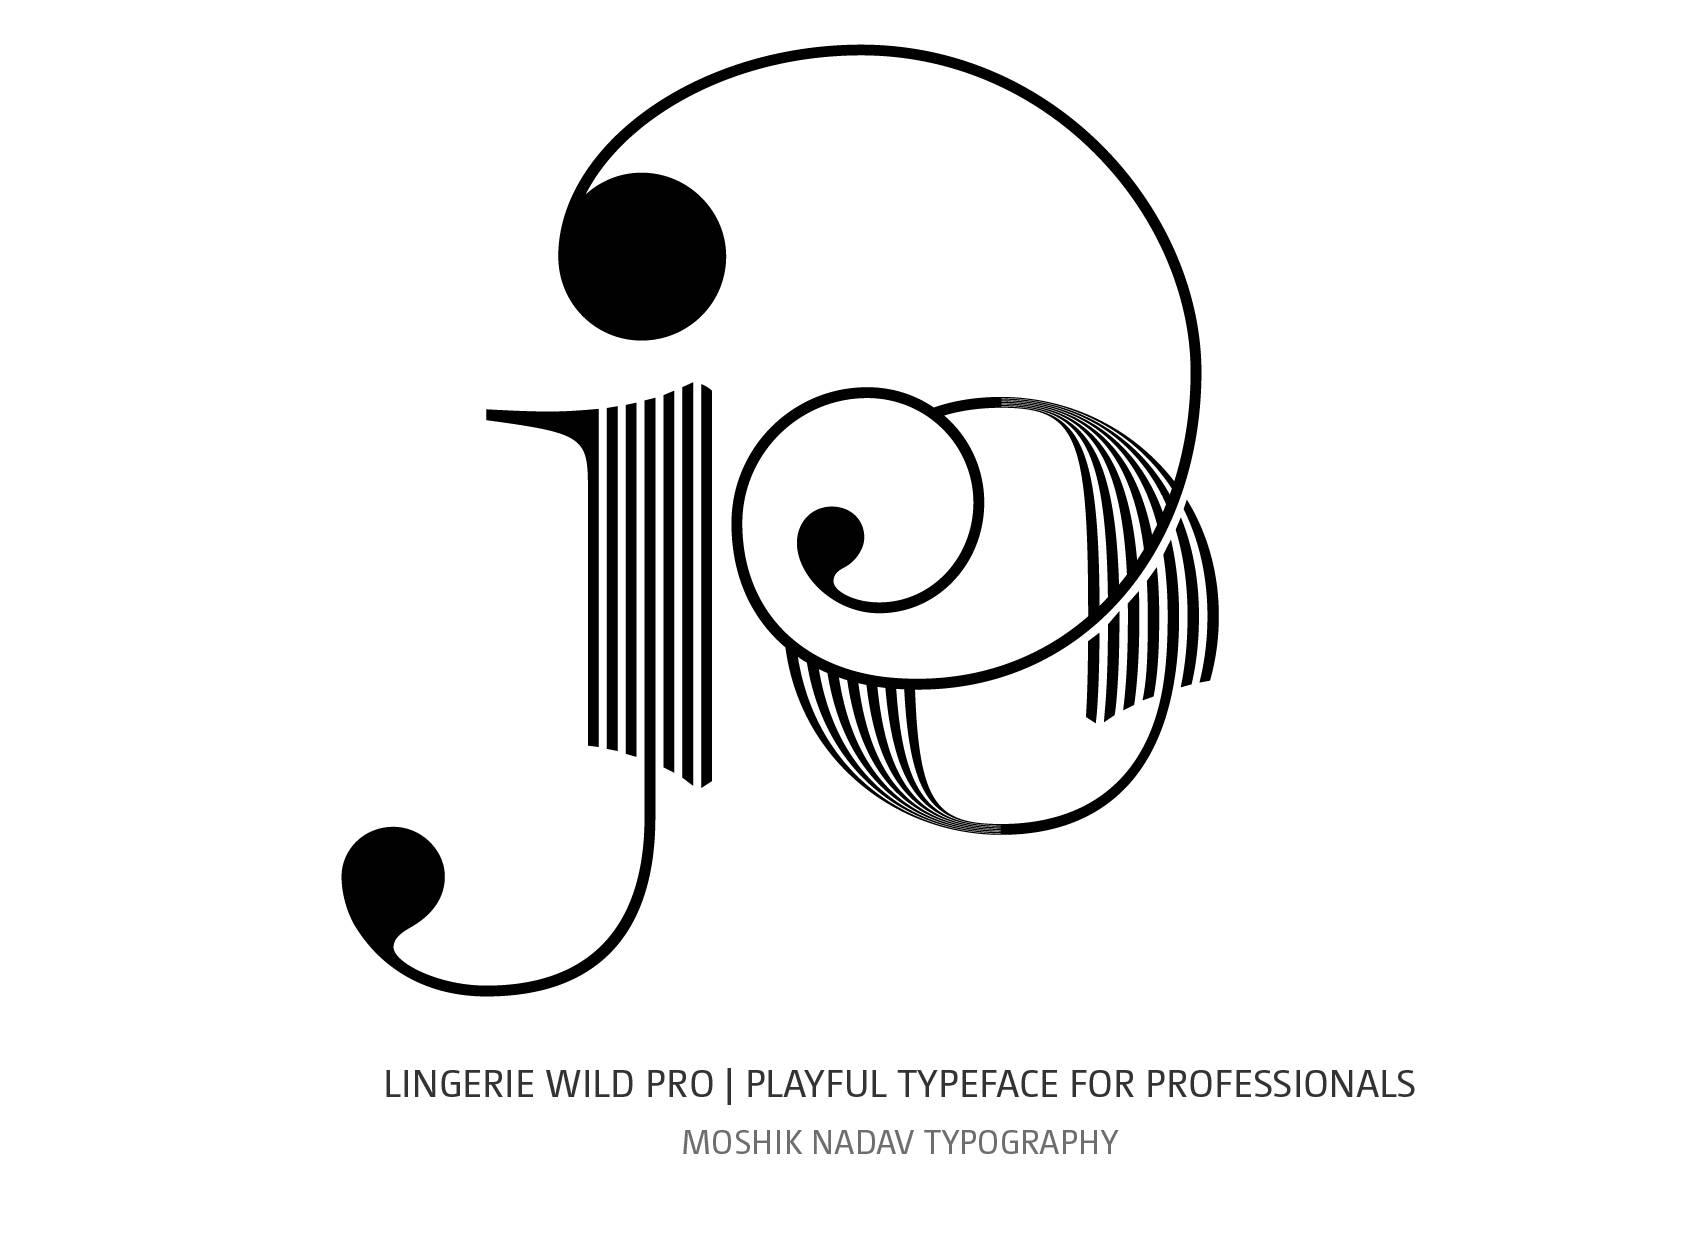 Super sexy jo ligature designed by Lingerie Wild Pro Typeface